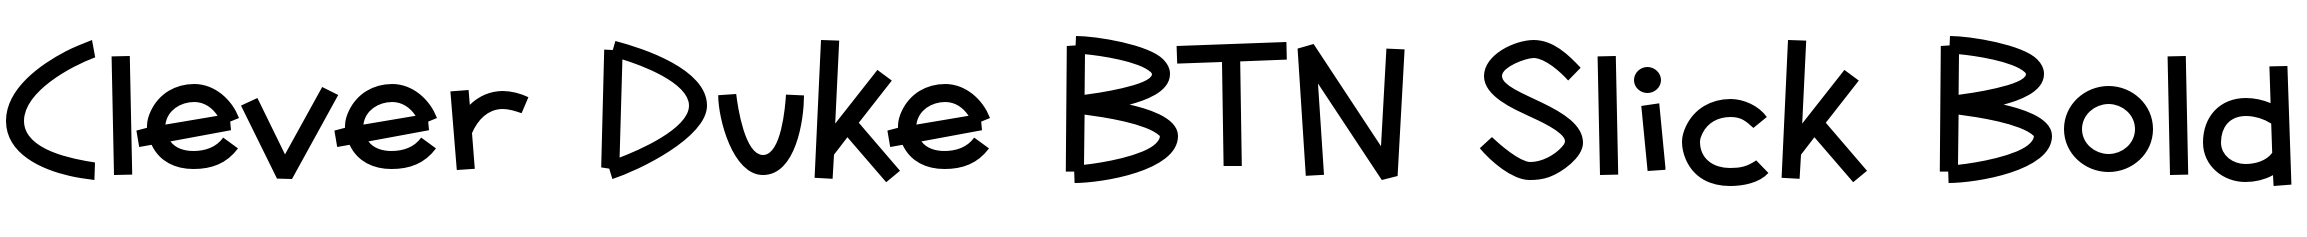 Clever Duke BTN Slick Bold